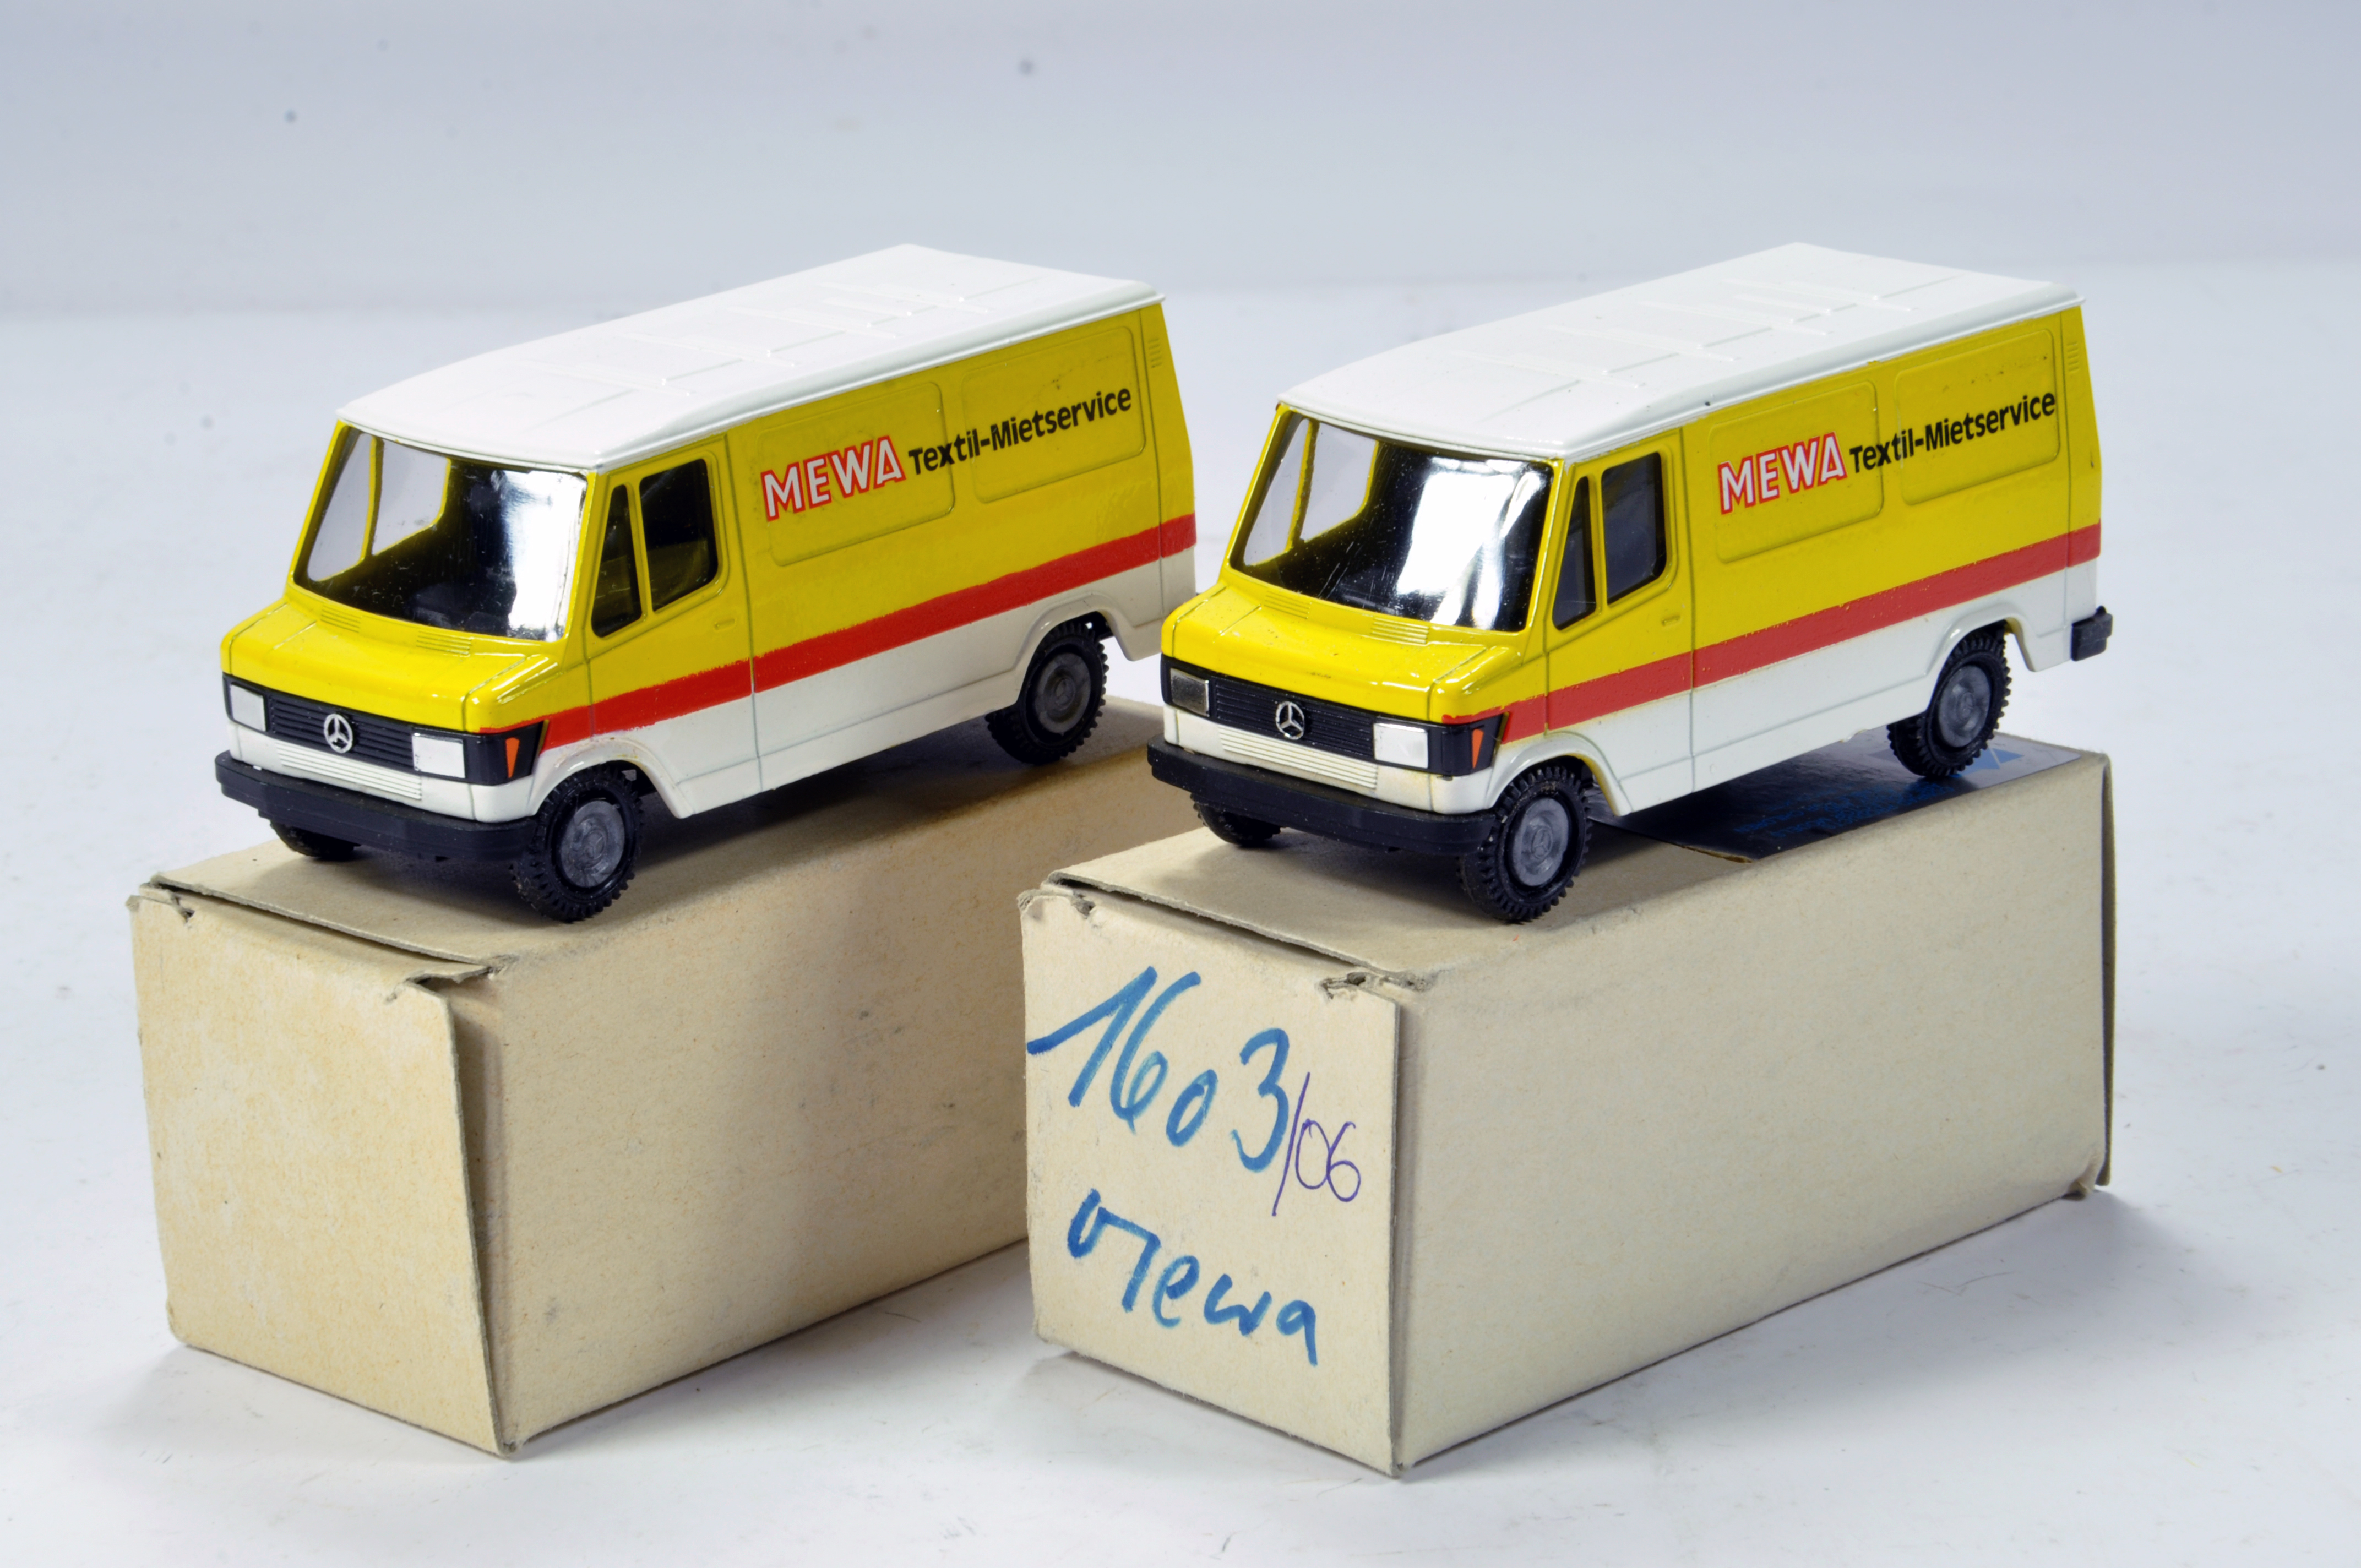 Lot 326 - Conrad 1/50 Construction Diecast No. 1603 Mercedes Benz Service Vans. Mewa. Scarce Promotional